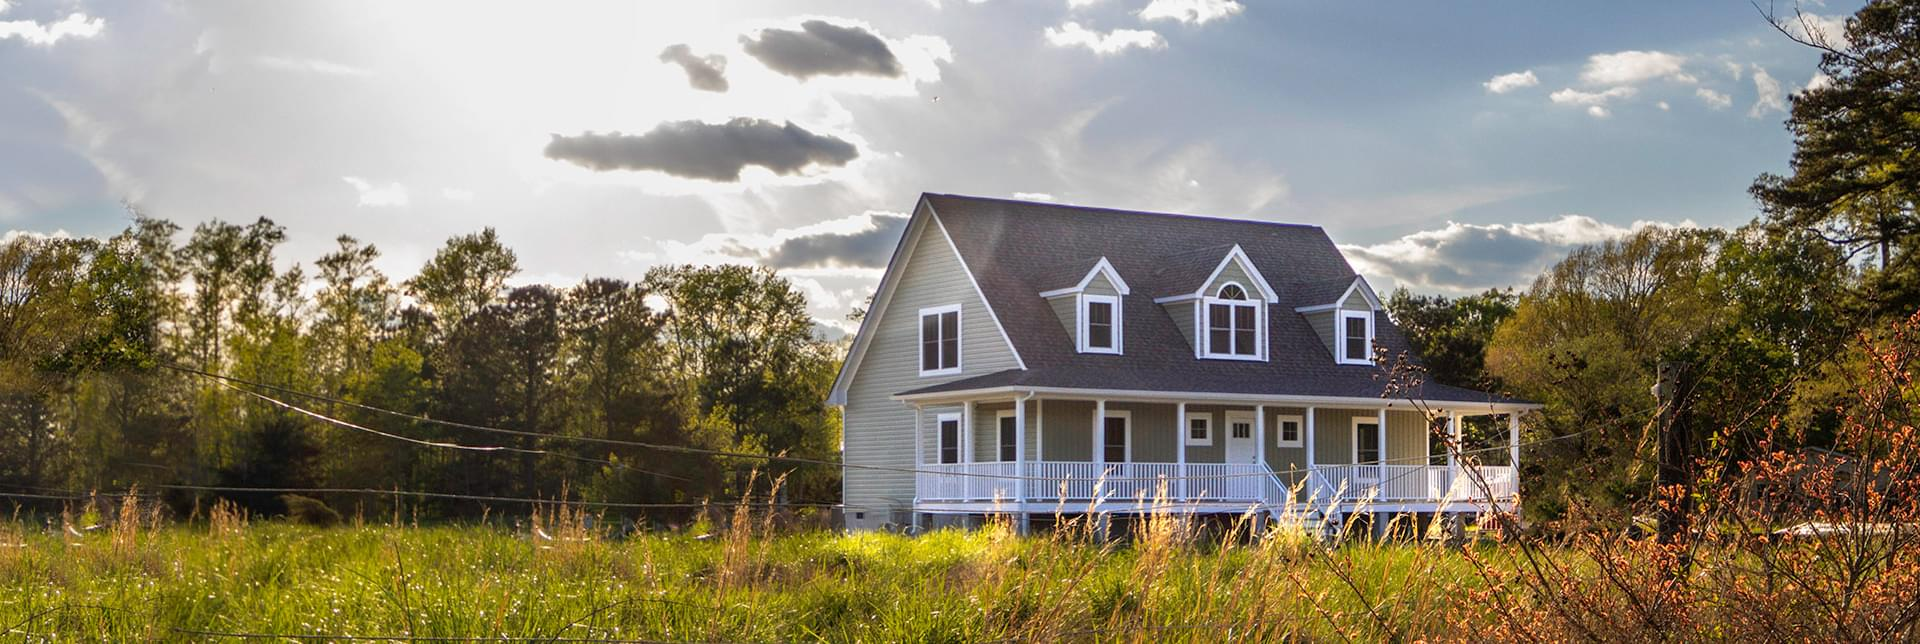 New Homes in Loudoun County VA